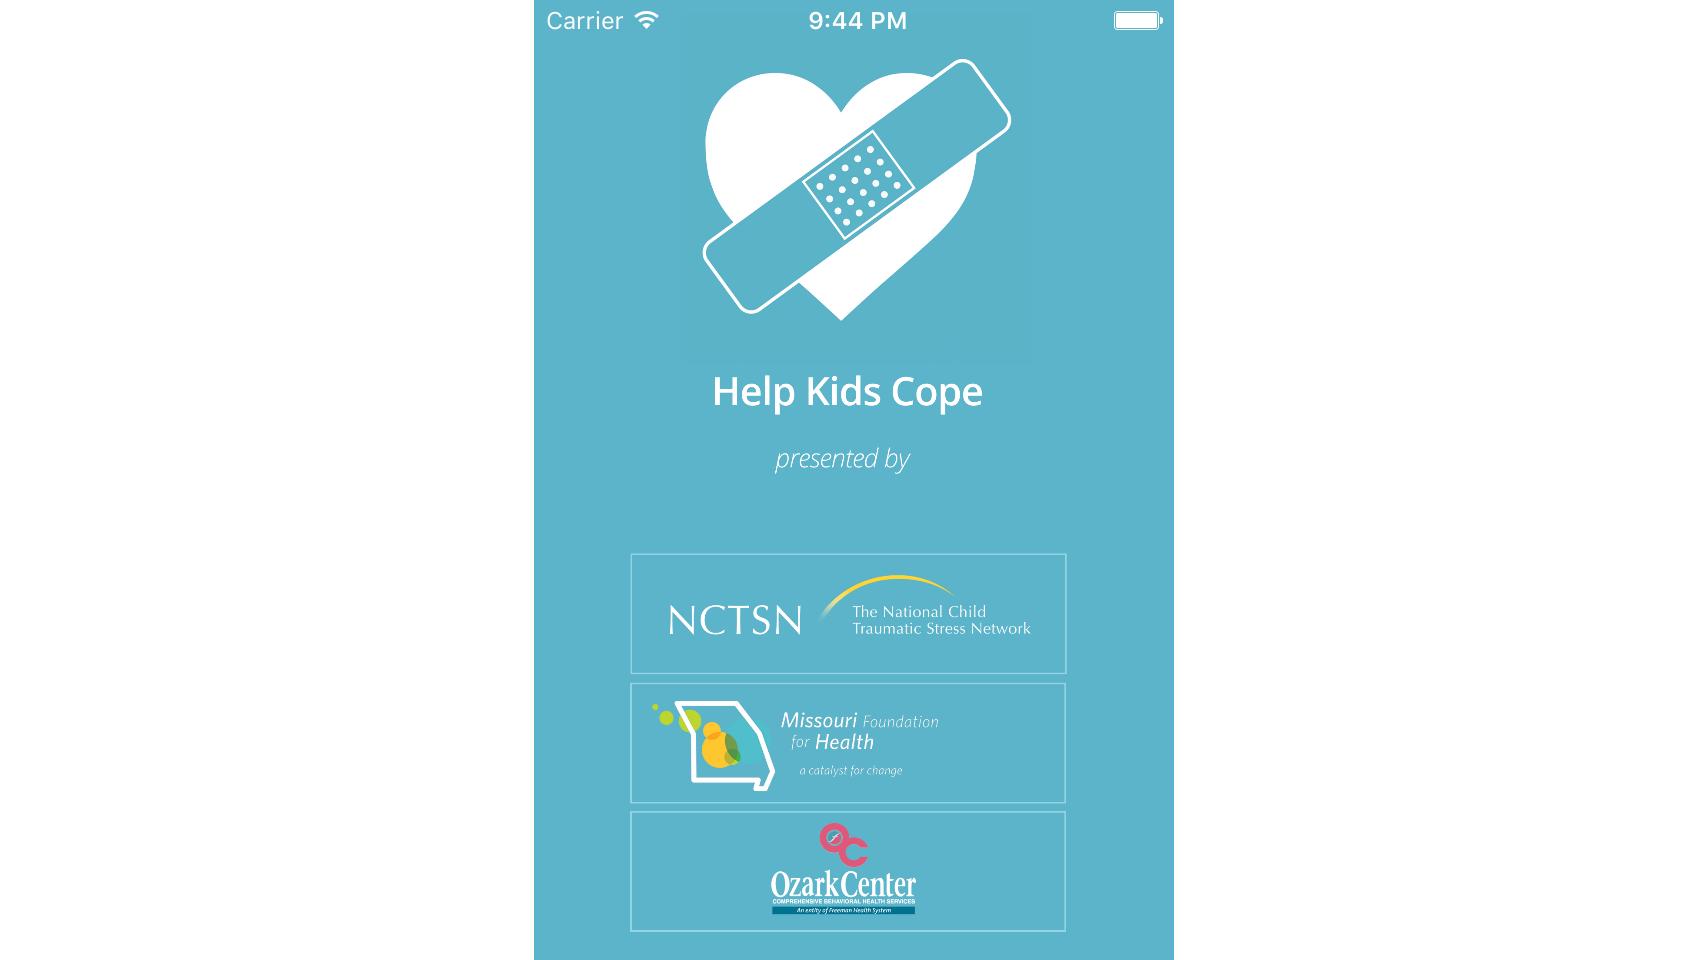 Help Kids Cope